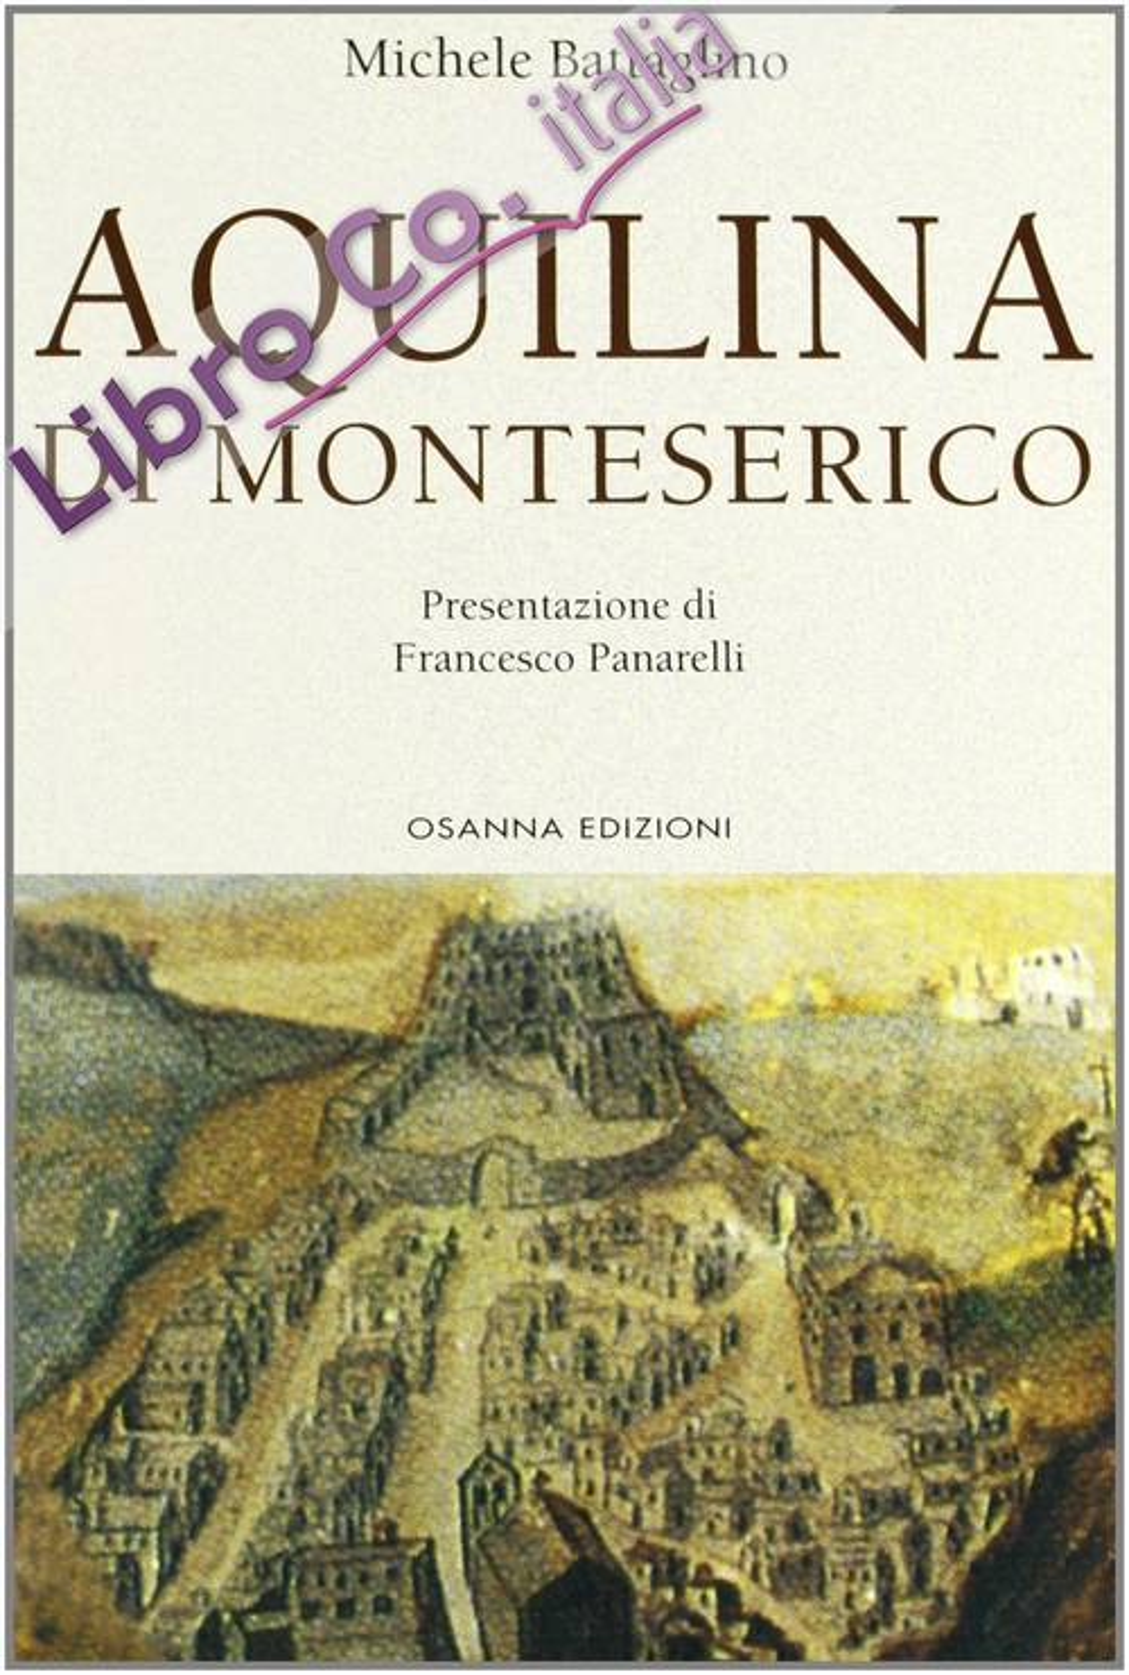 Aquilina di Monteserico